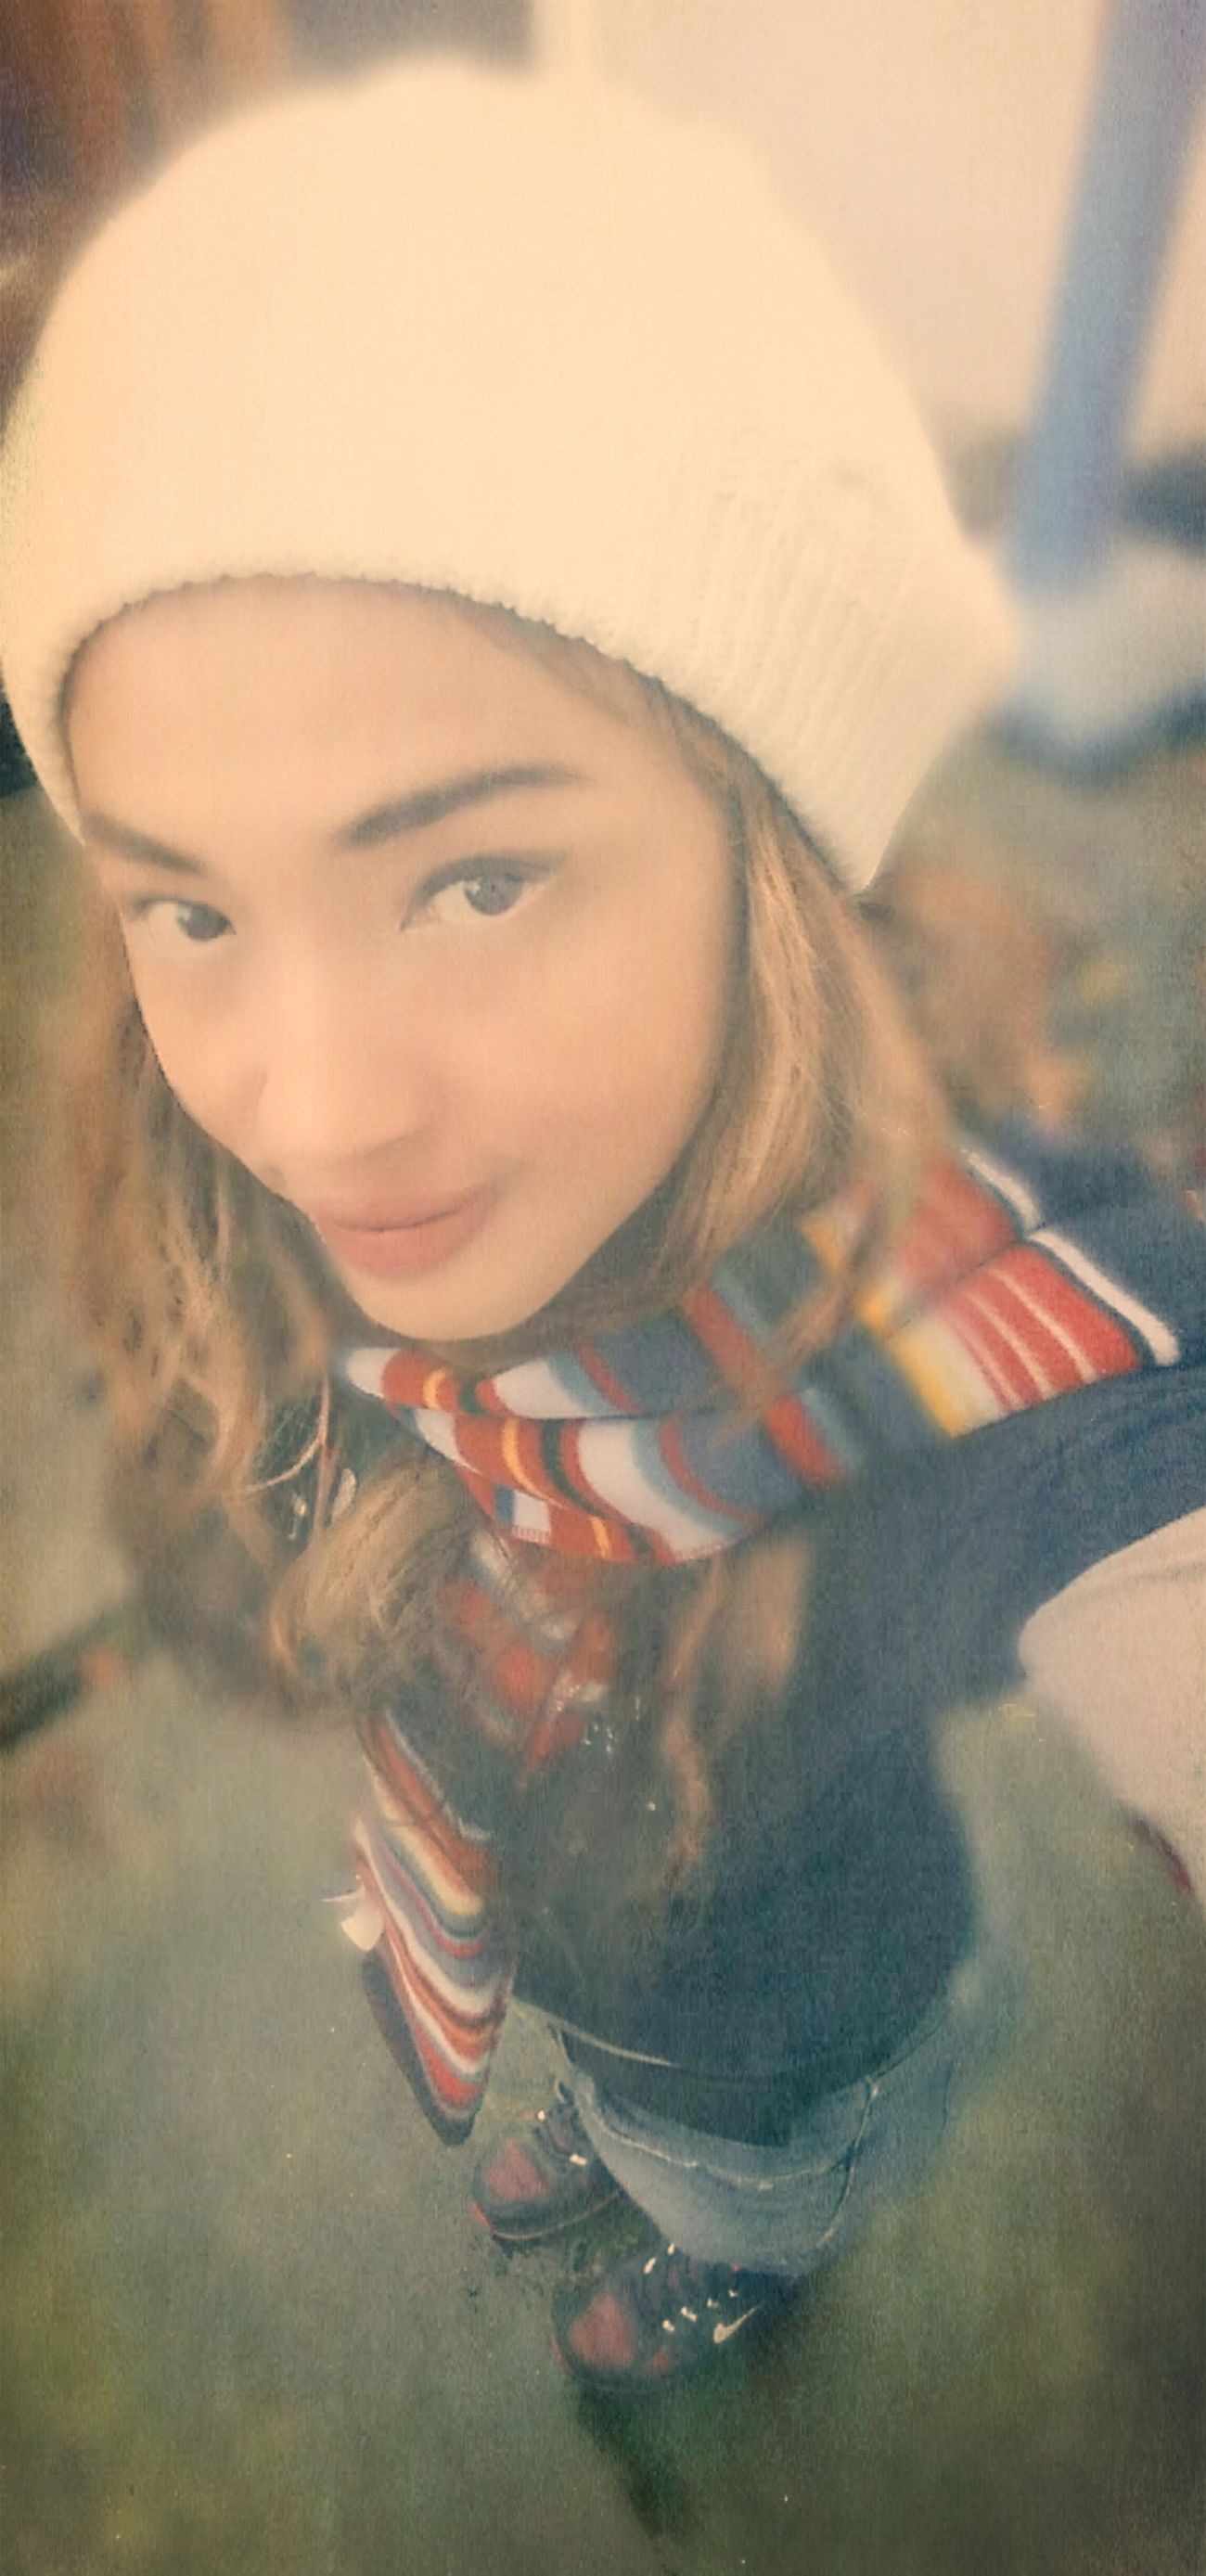 Selfie Selfshot Winter Upshot